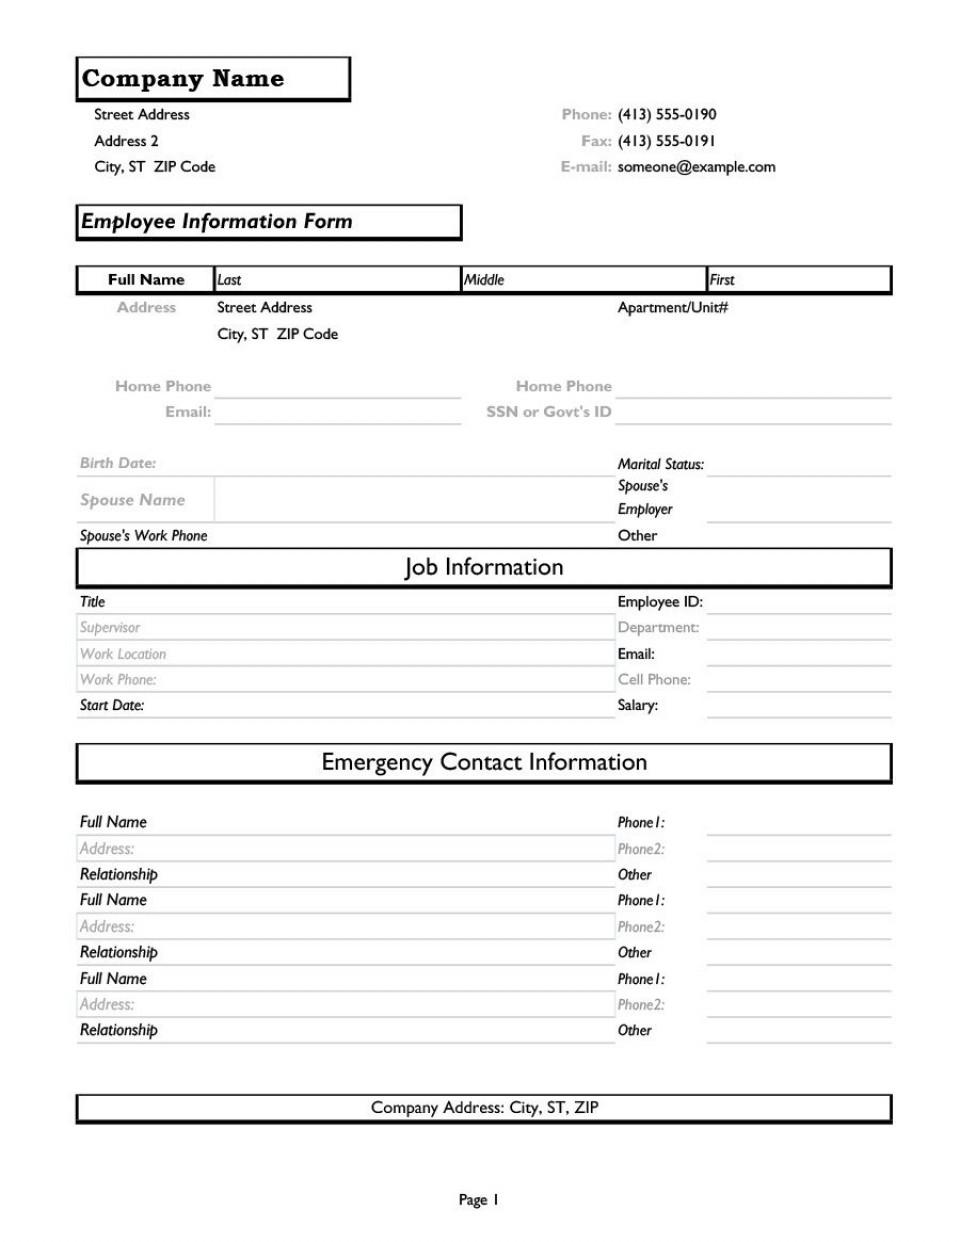 012 Unique Employee Personnel File Template Image  Checklist Request Form Release960